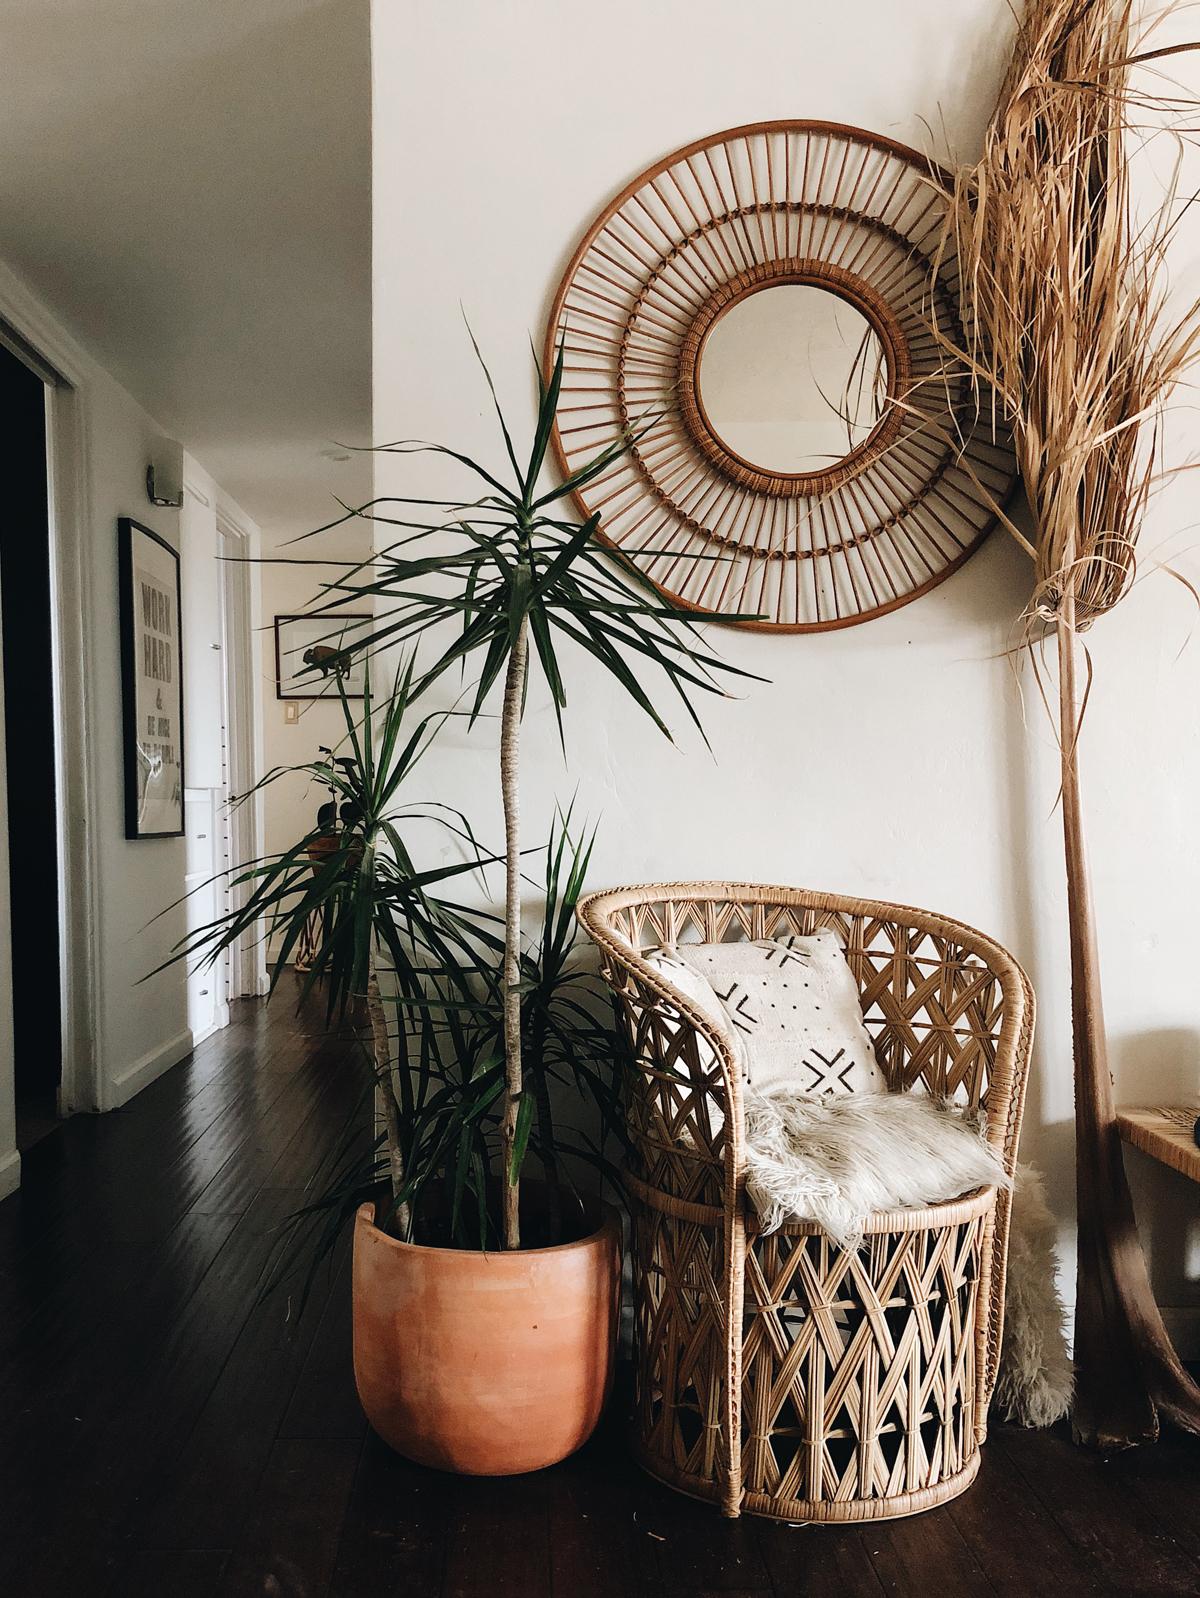 001-lifestyle--bohemian--home-design--albuquerque--plants.jpg